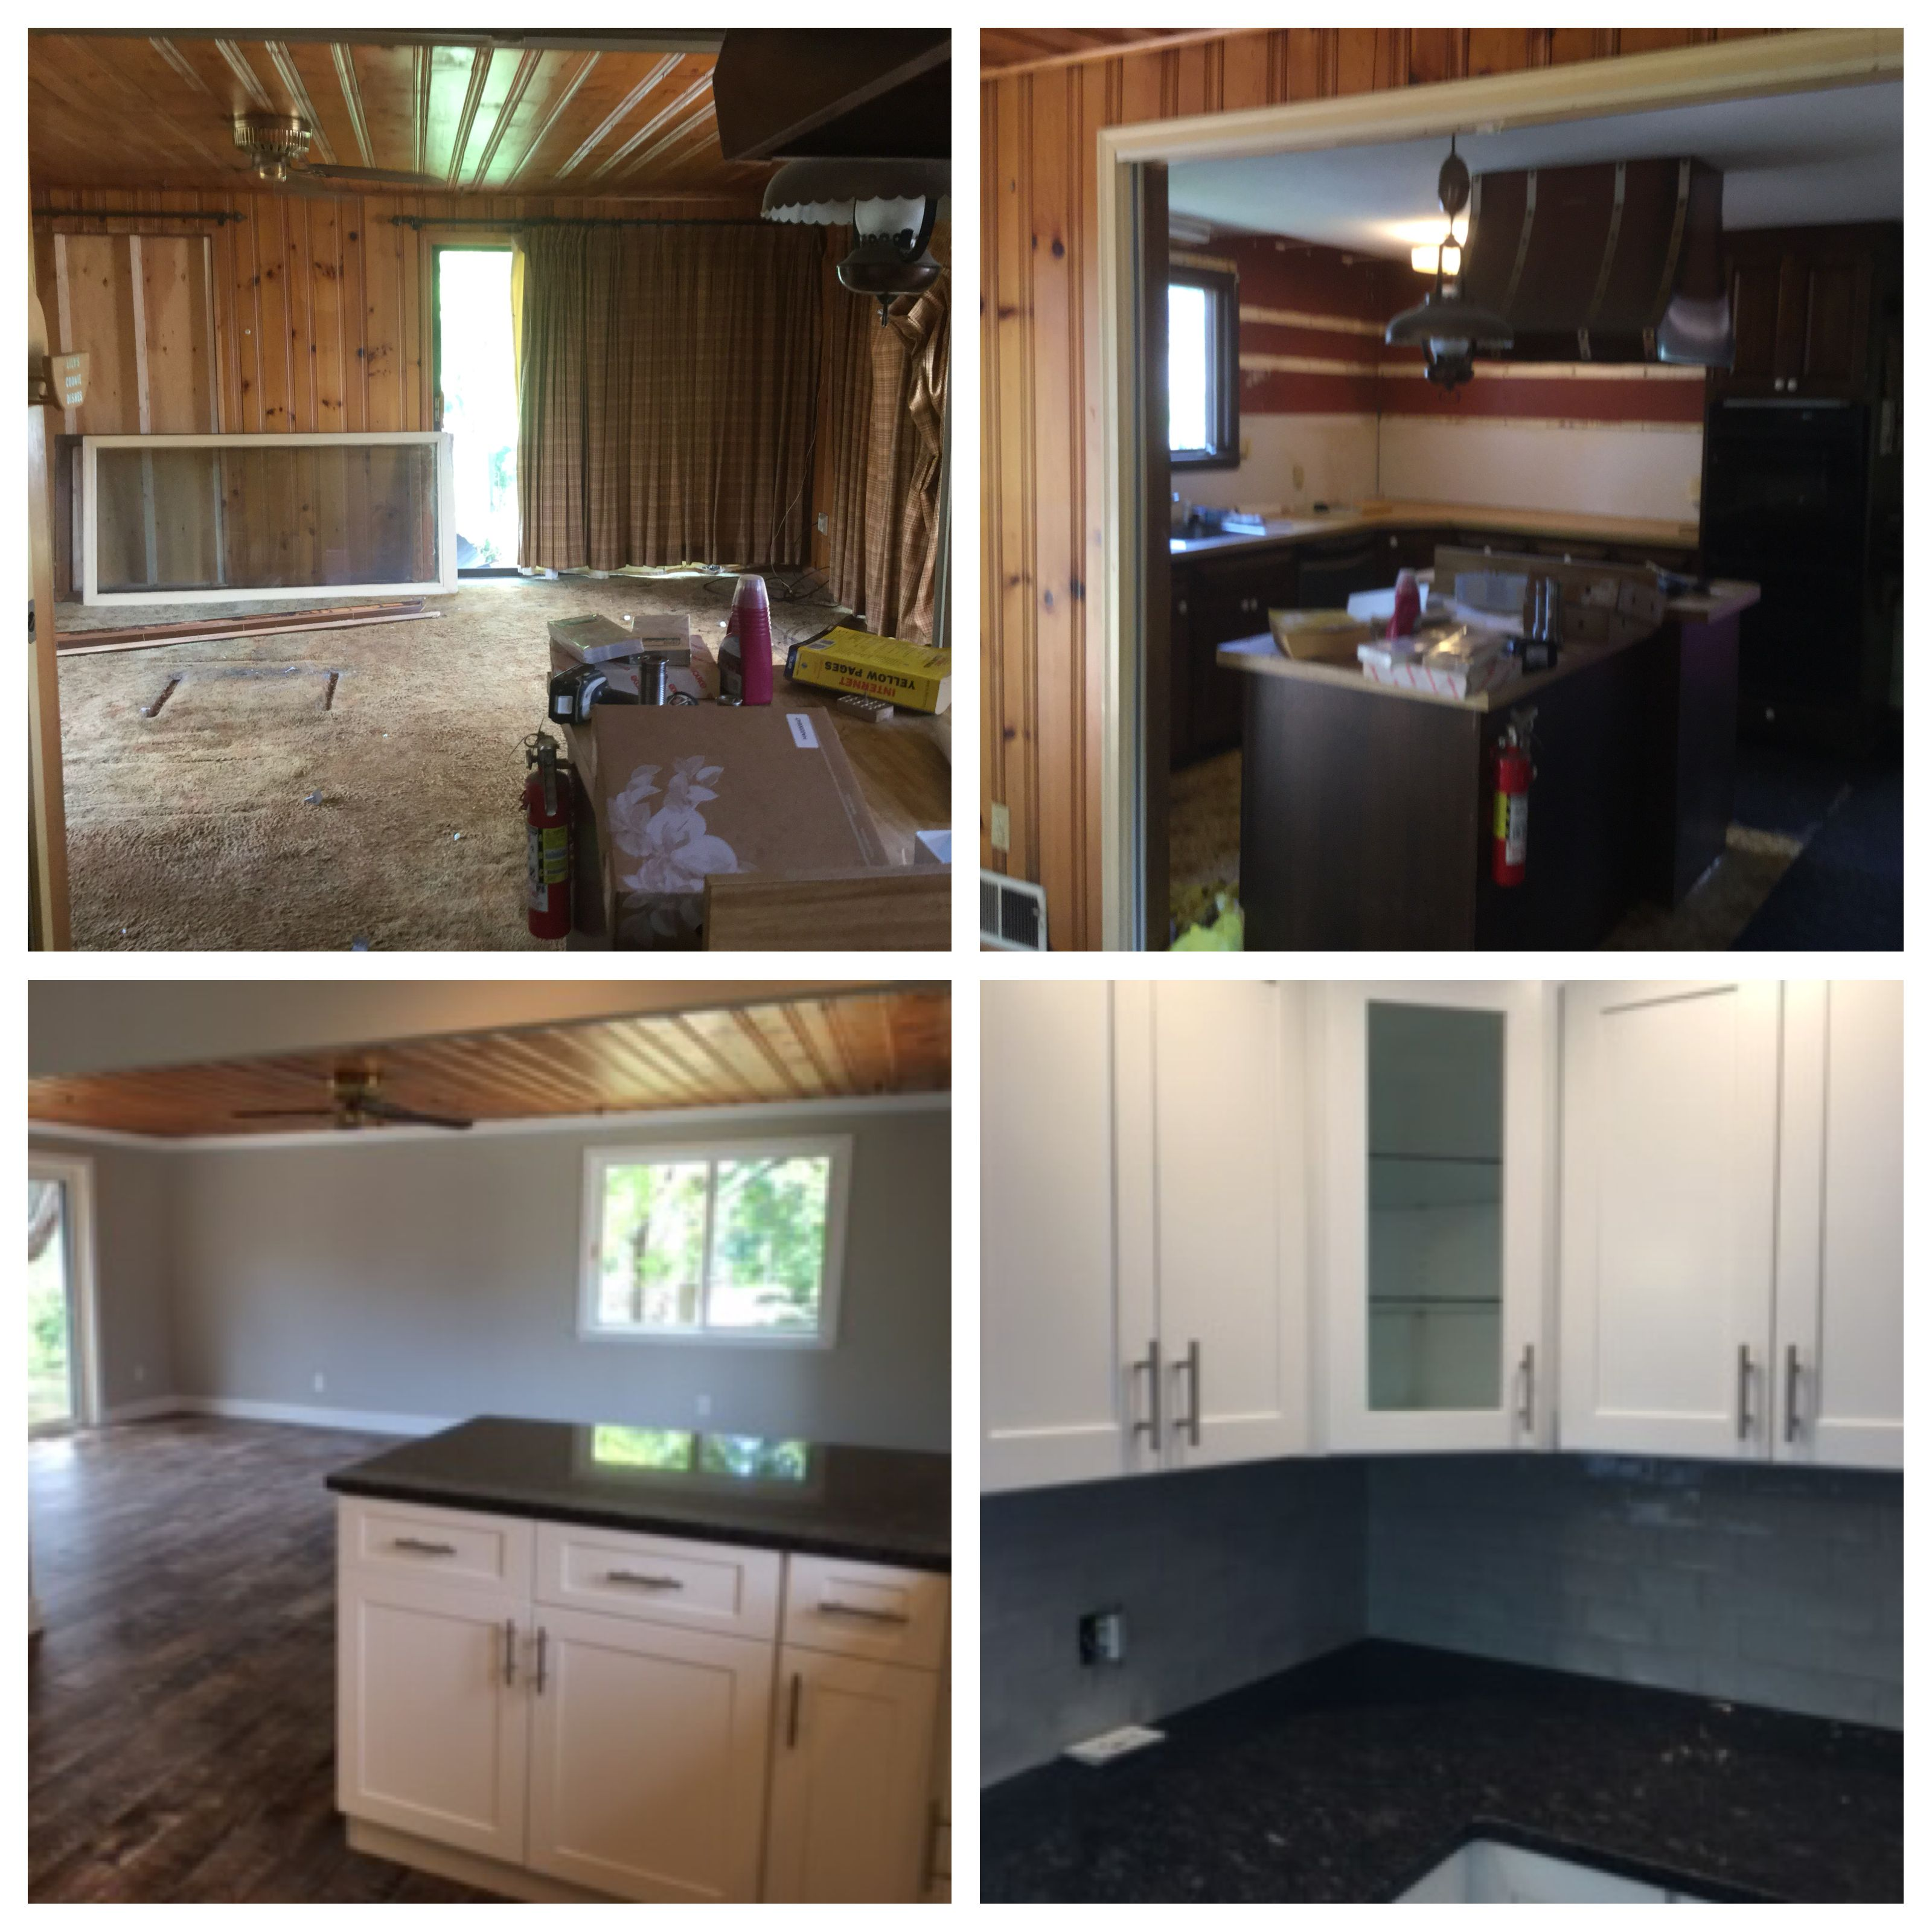 #pixlr | Design, Home decor, Kitchen cabinets